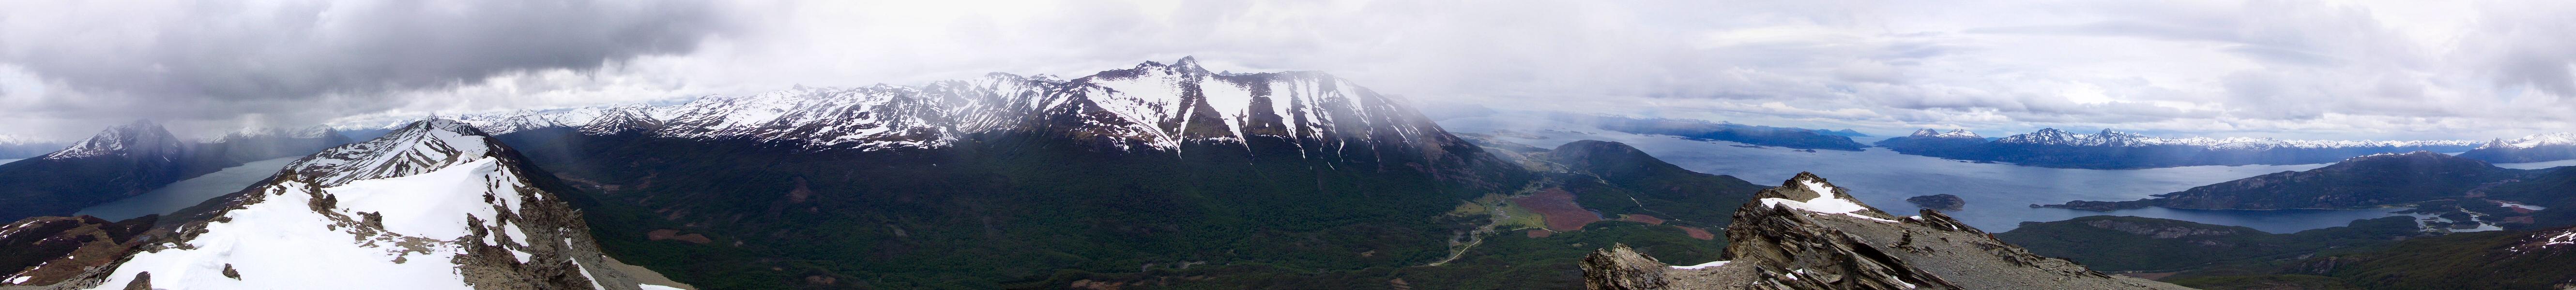 Cerro Guanaco